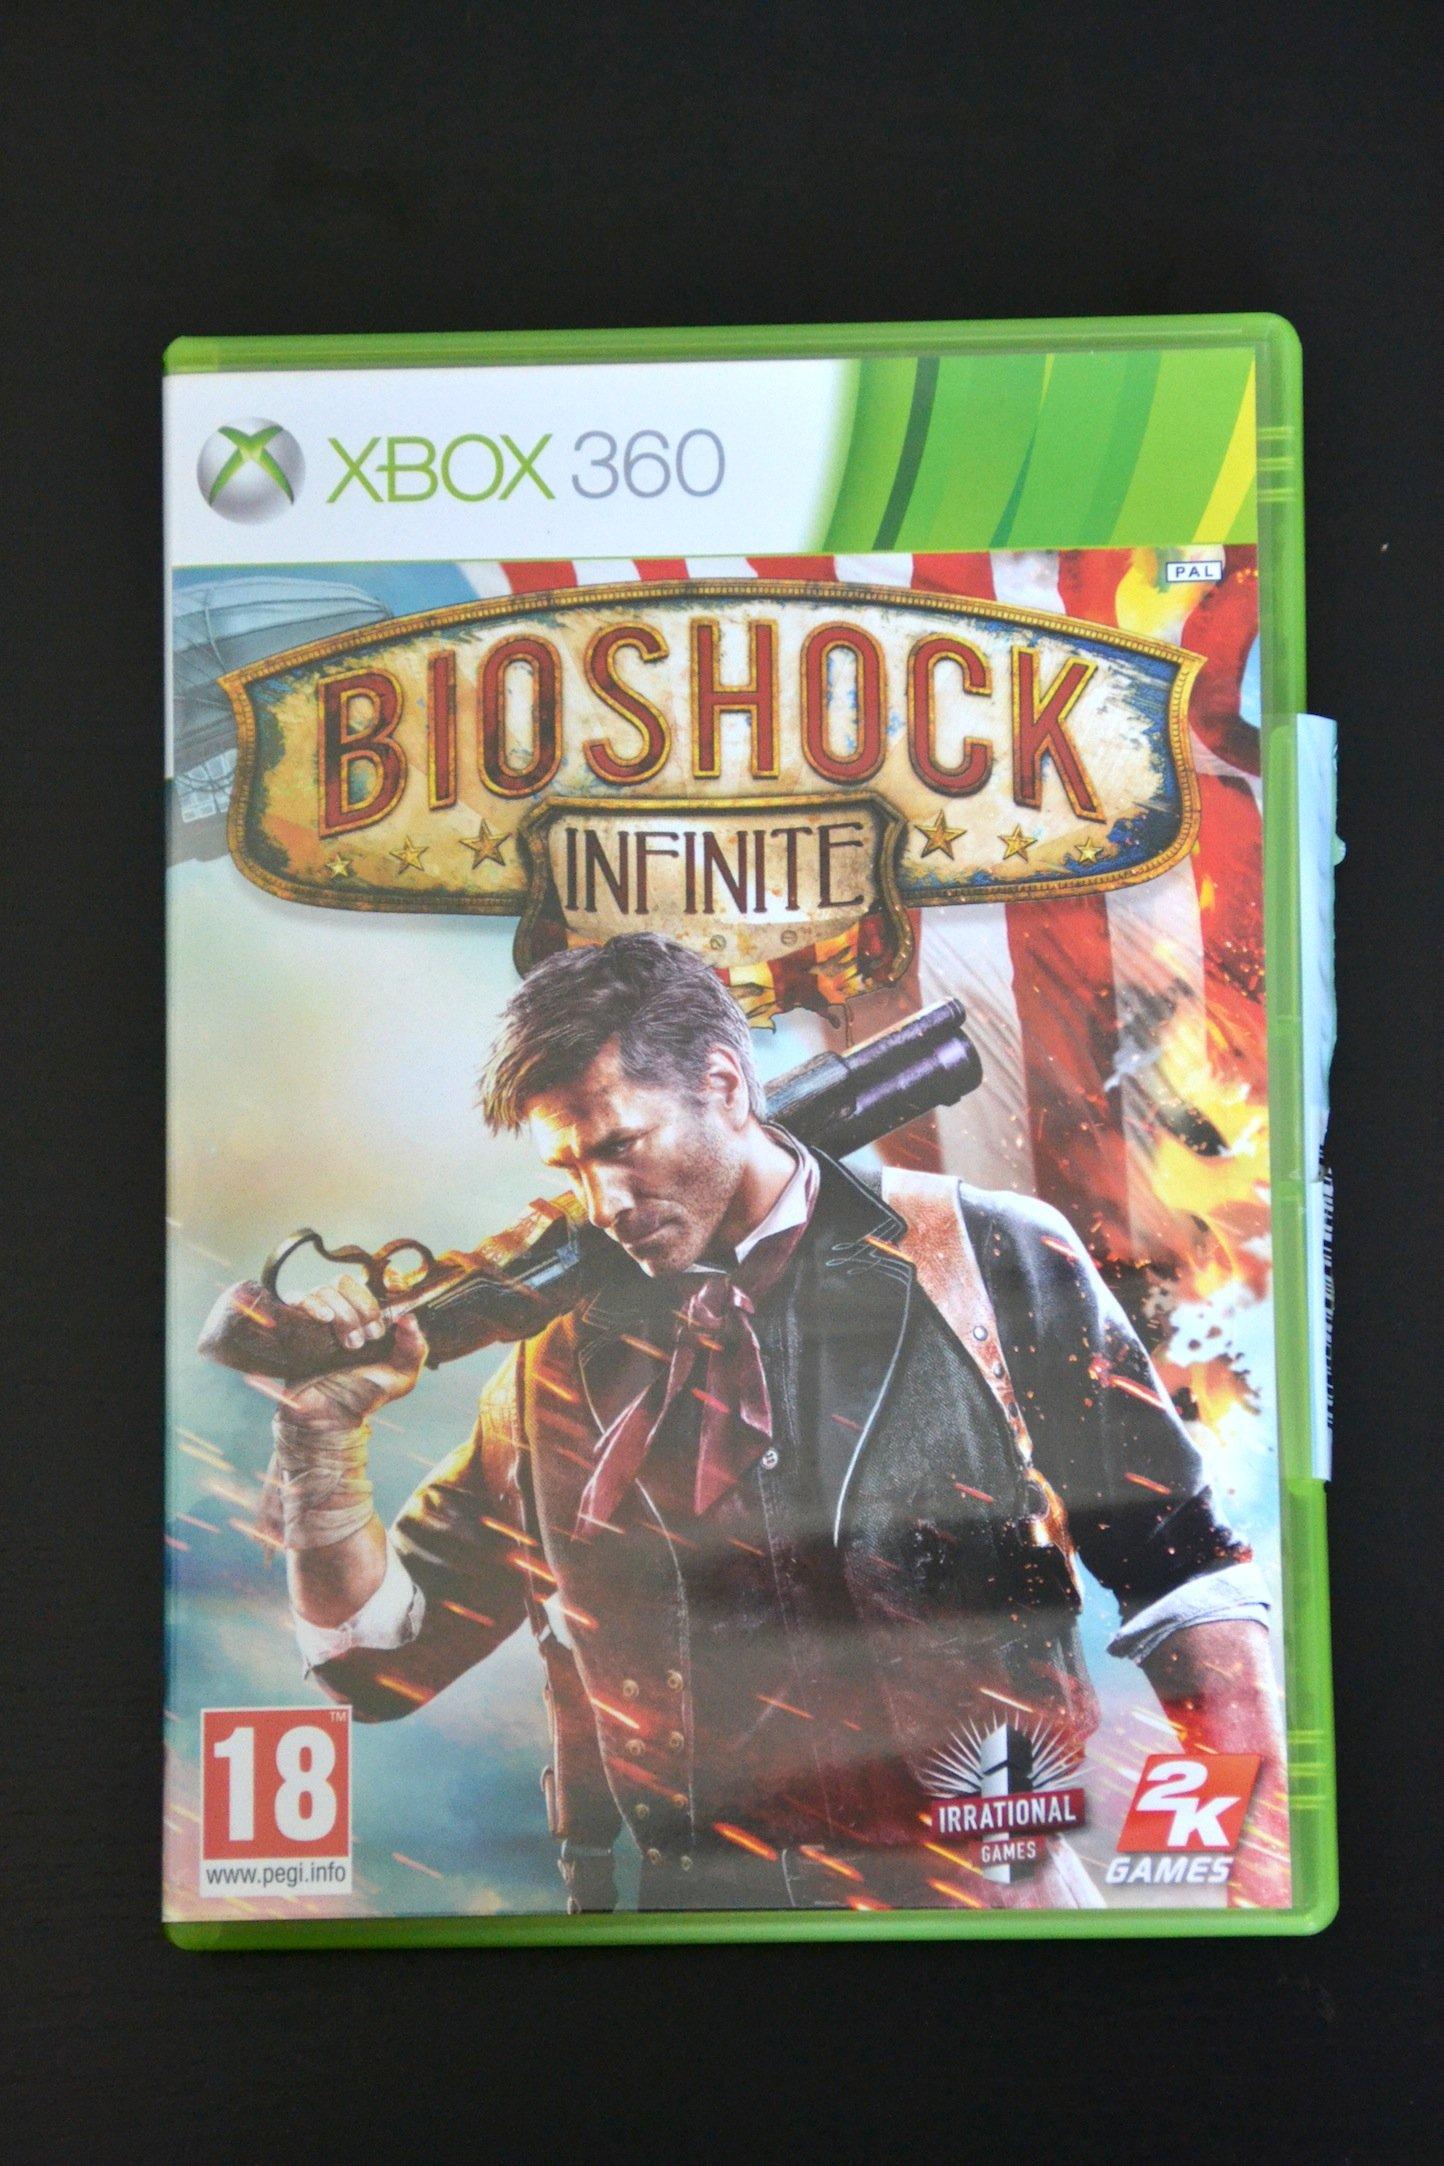 achats de la semaine #8 : Soul Sacrifice (bonus inside)+Bioshock